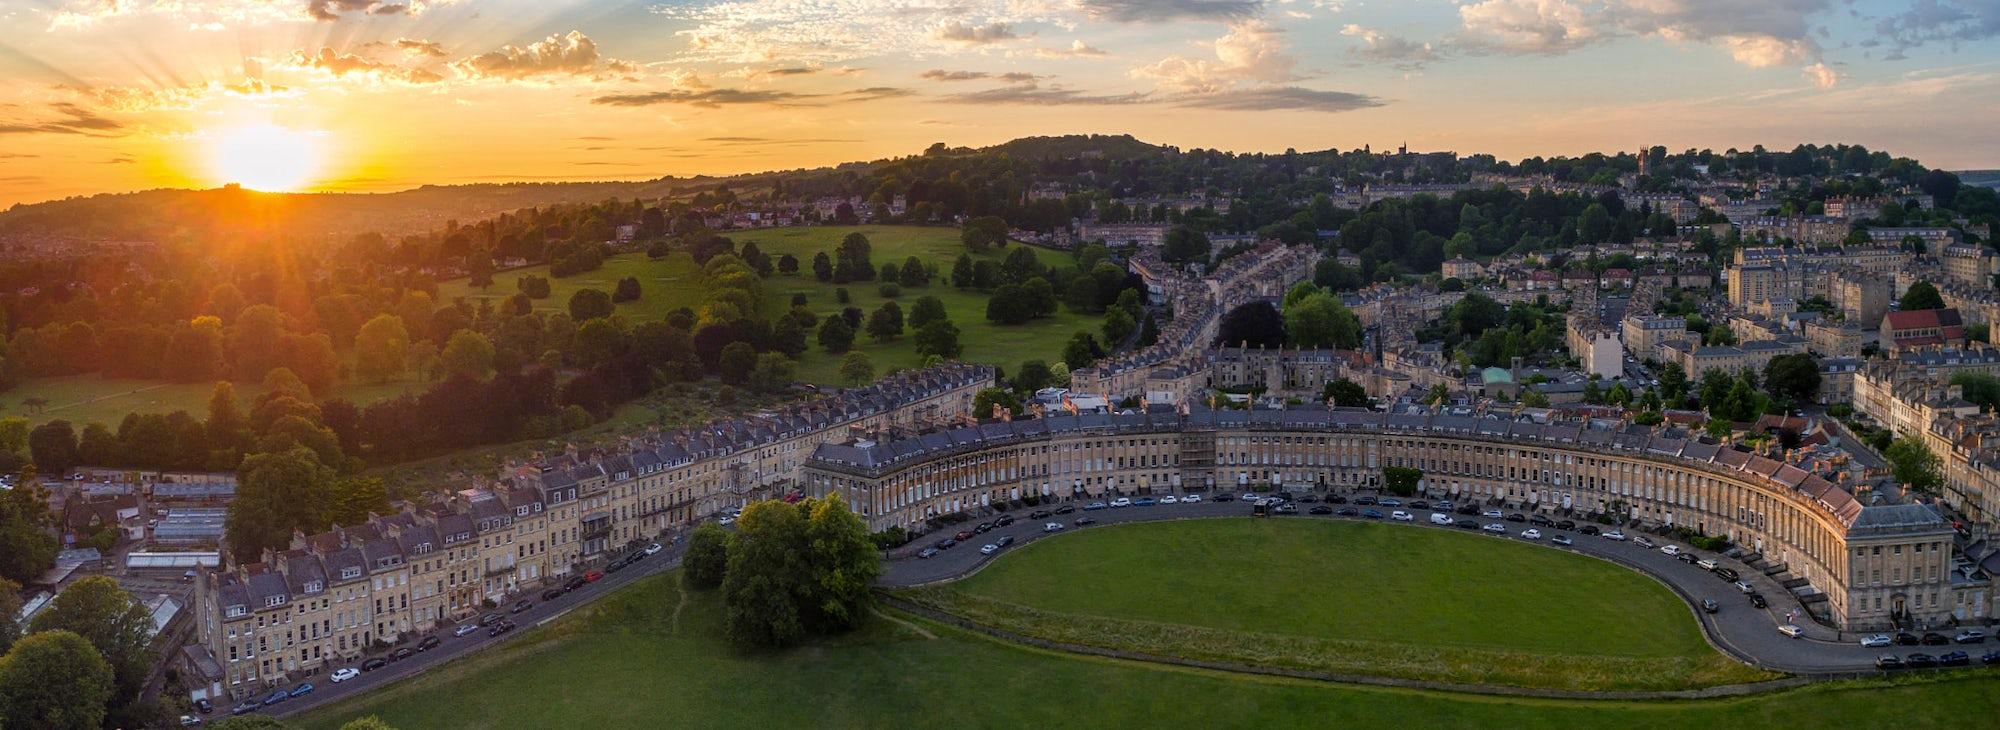 Sunset over Bath